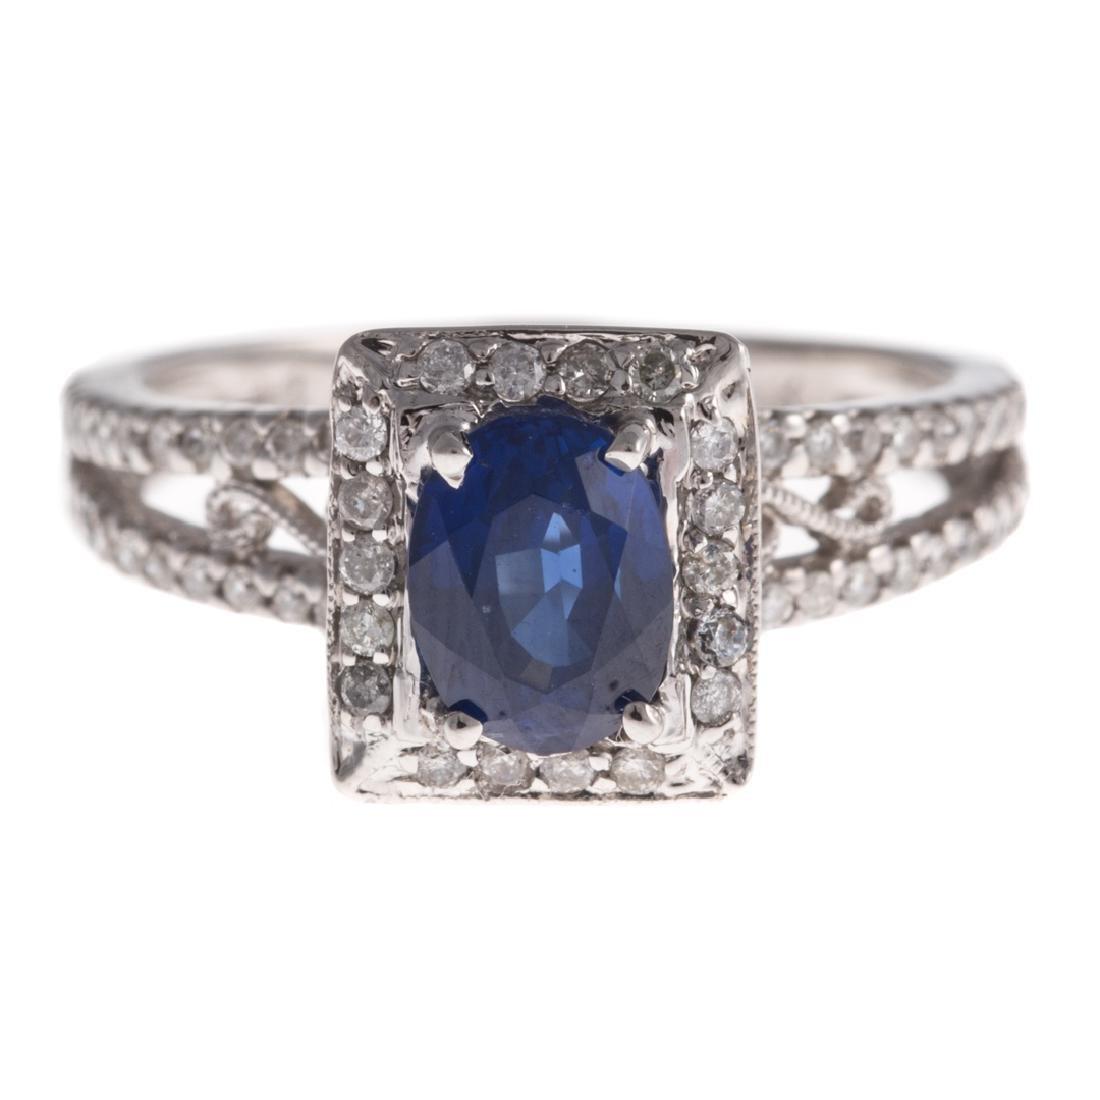 A Lady's 14K White Gold Sapphire & Diamond Ring